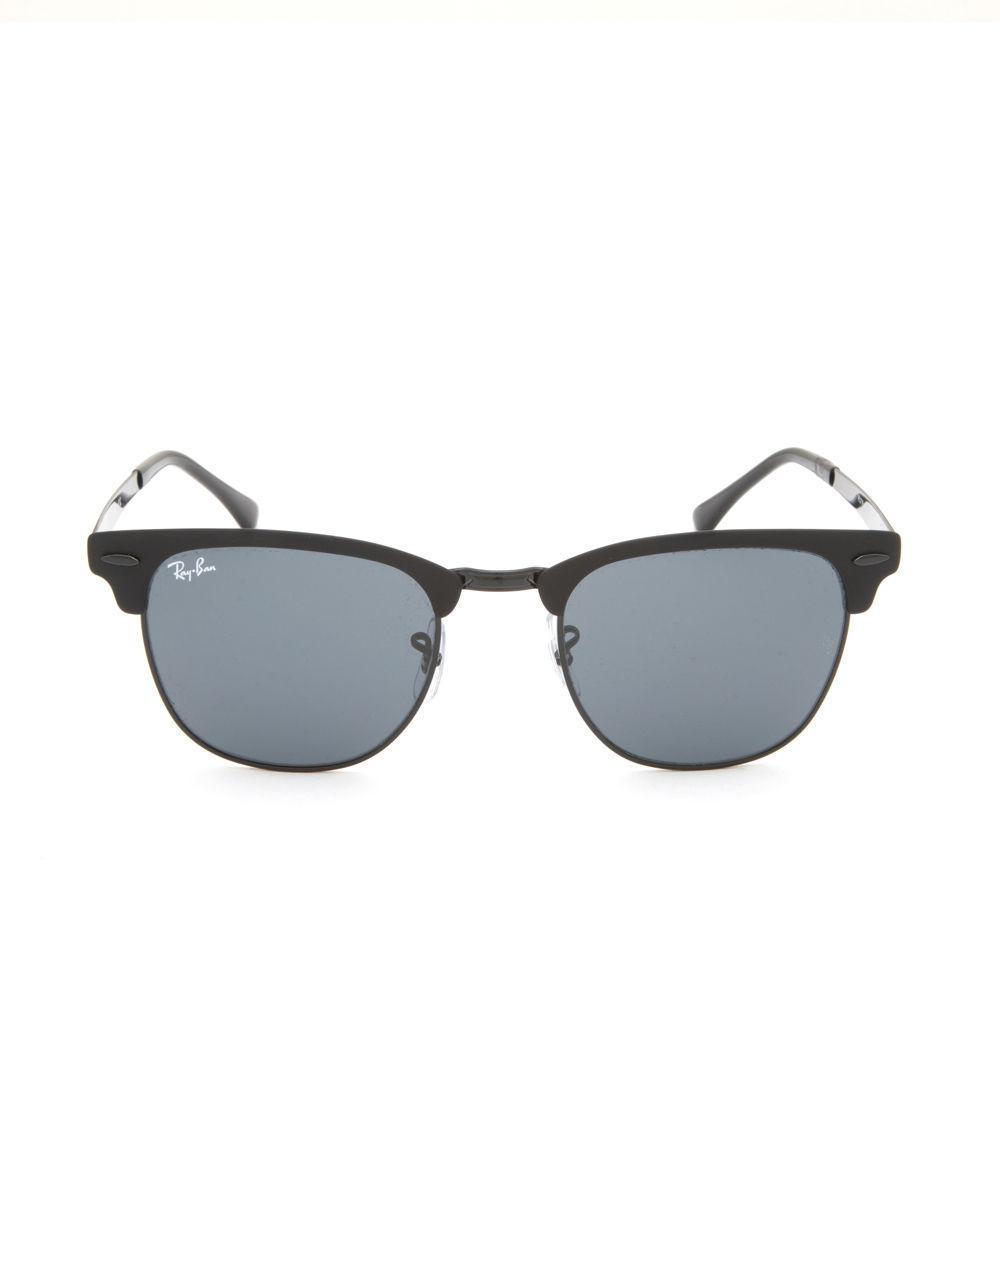 098d56e0fa Lyst - Ray-Ban Clubmaster Metal Black   Black Gradient Sunglasses in Black